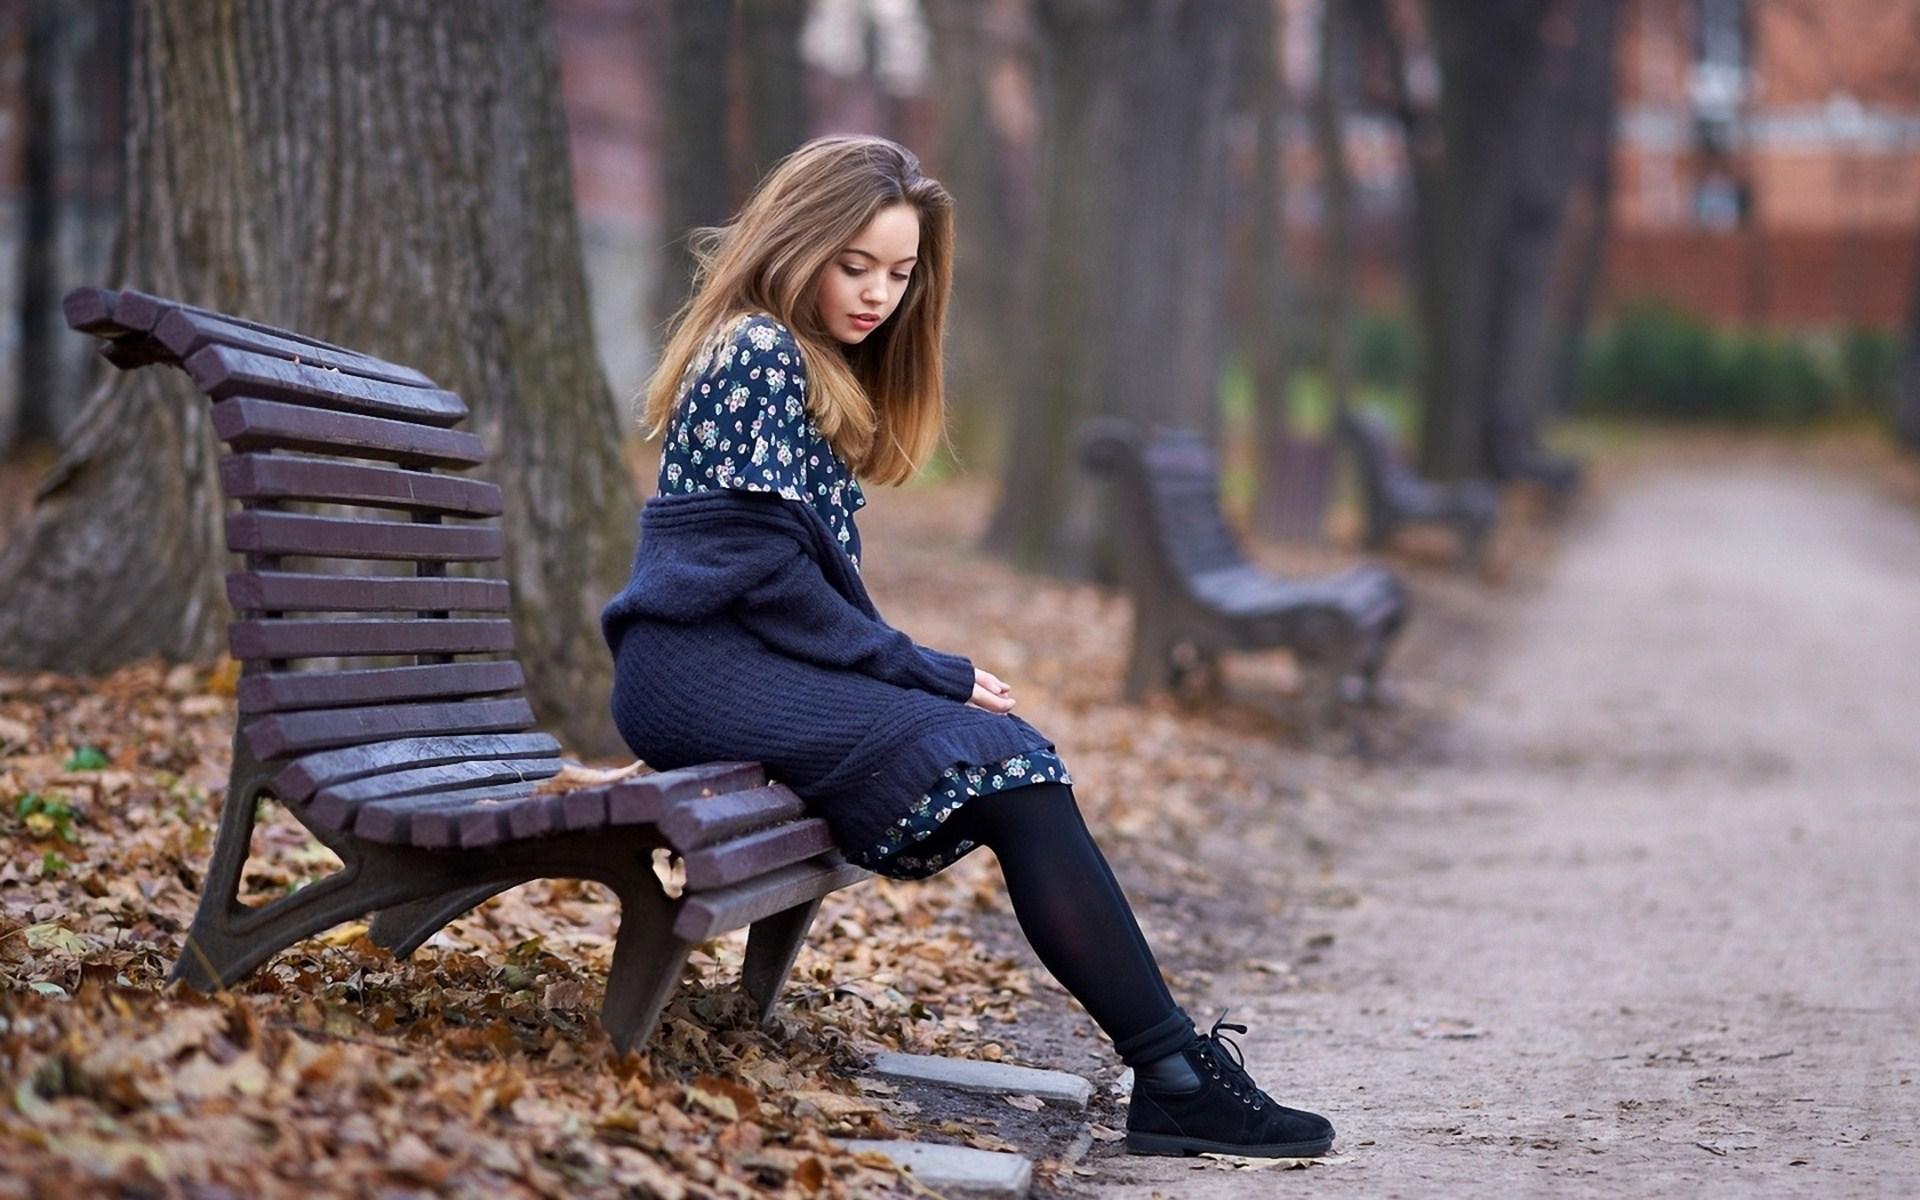 Beauty Blonde Girl Park Bench Autumn Photo